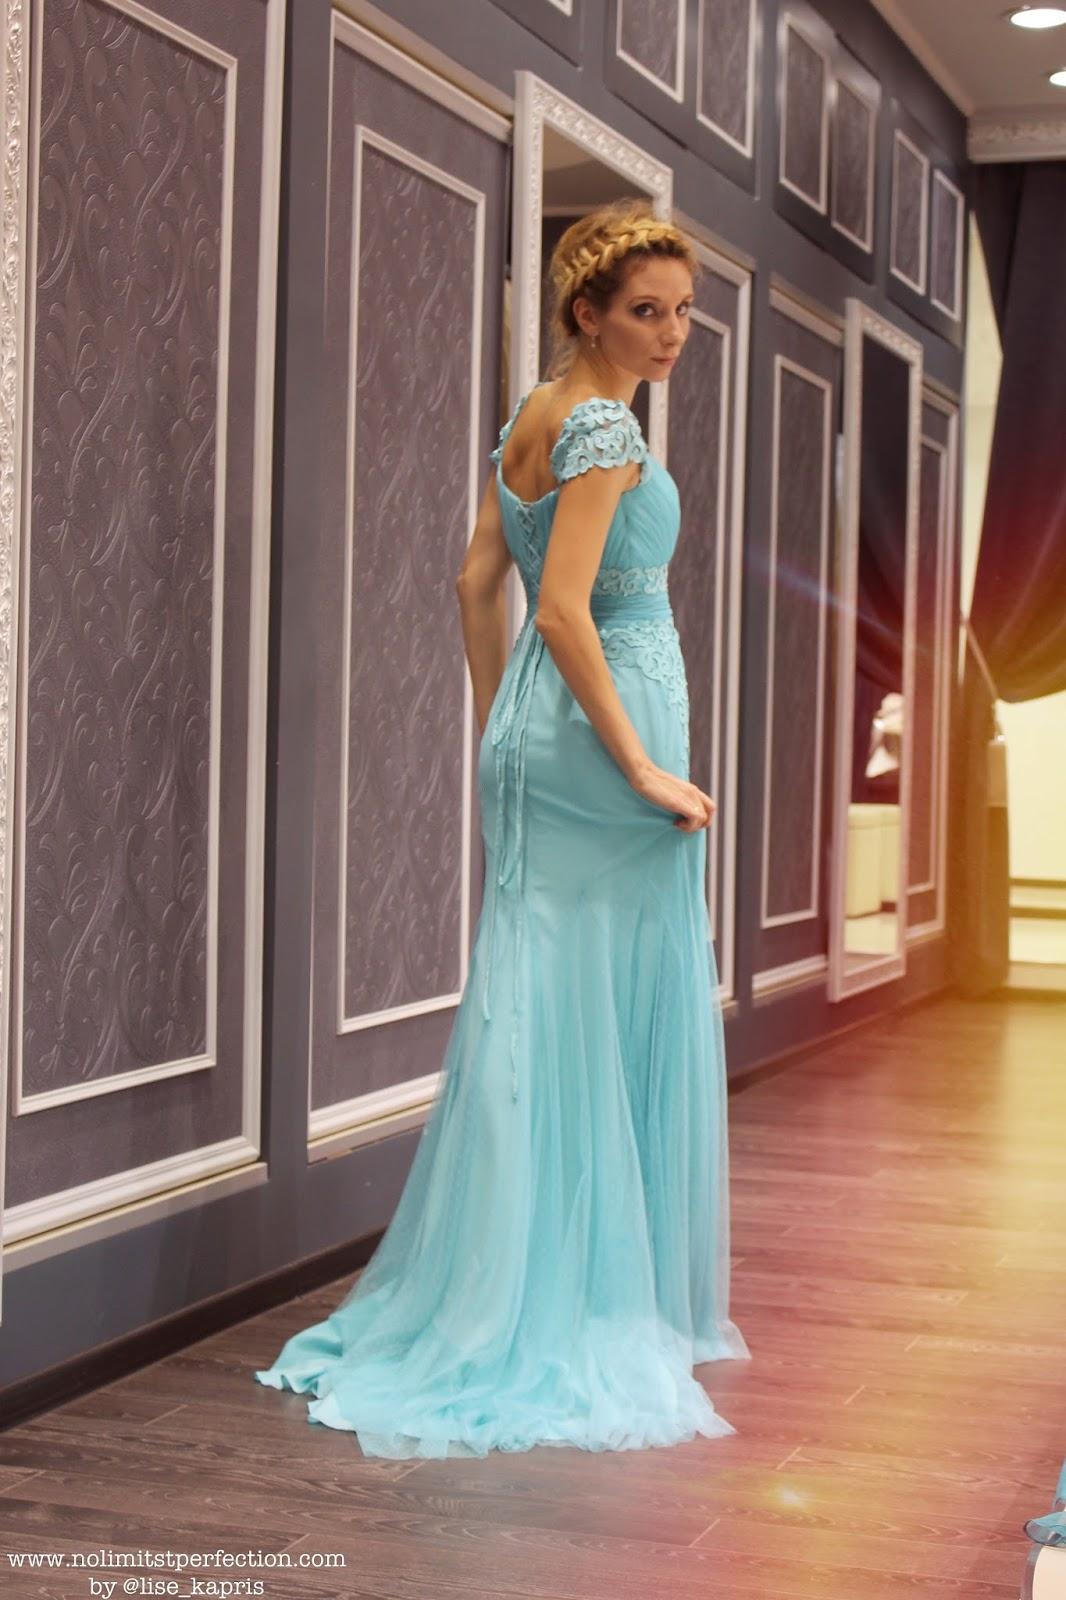 Top fashion bloggers Lise Kapris